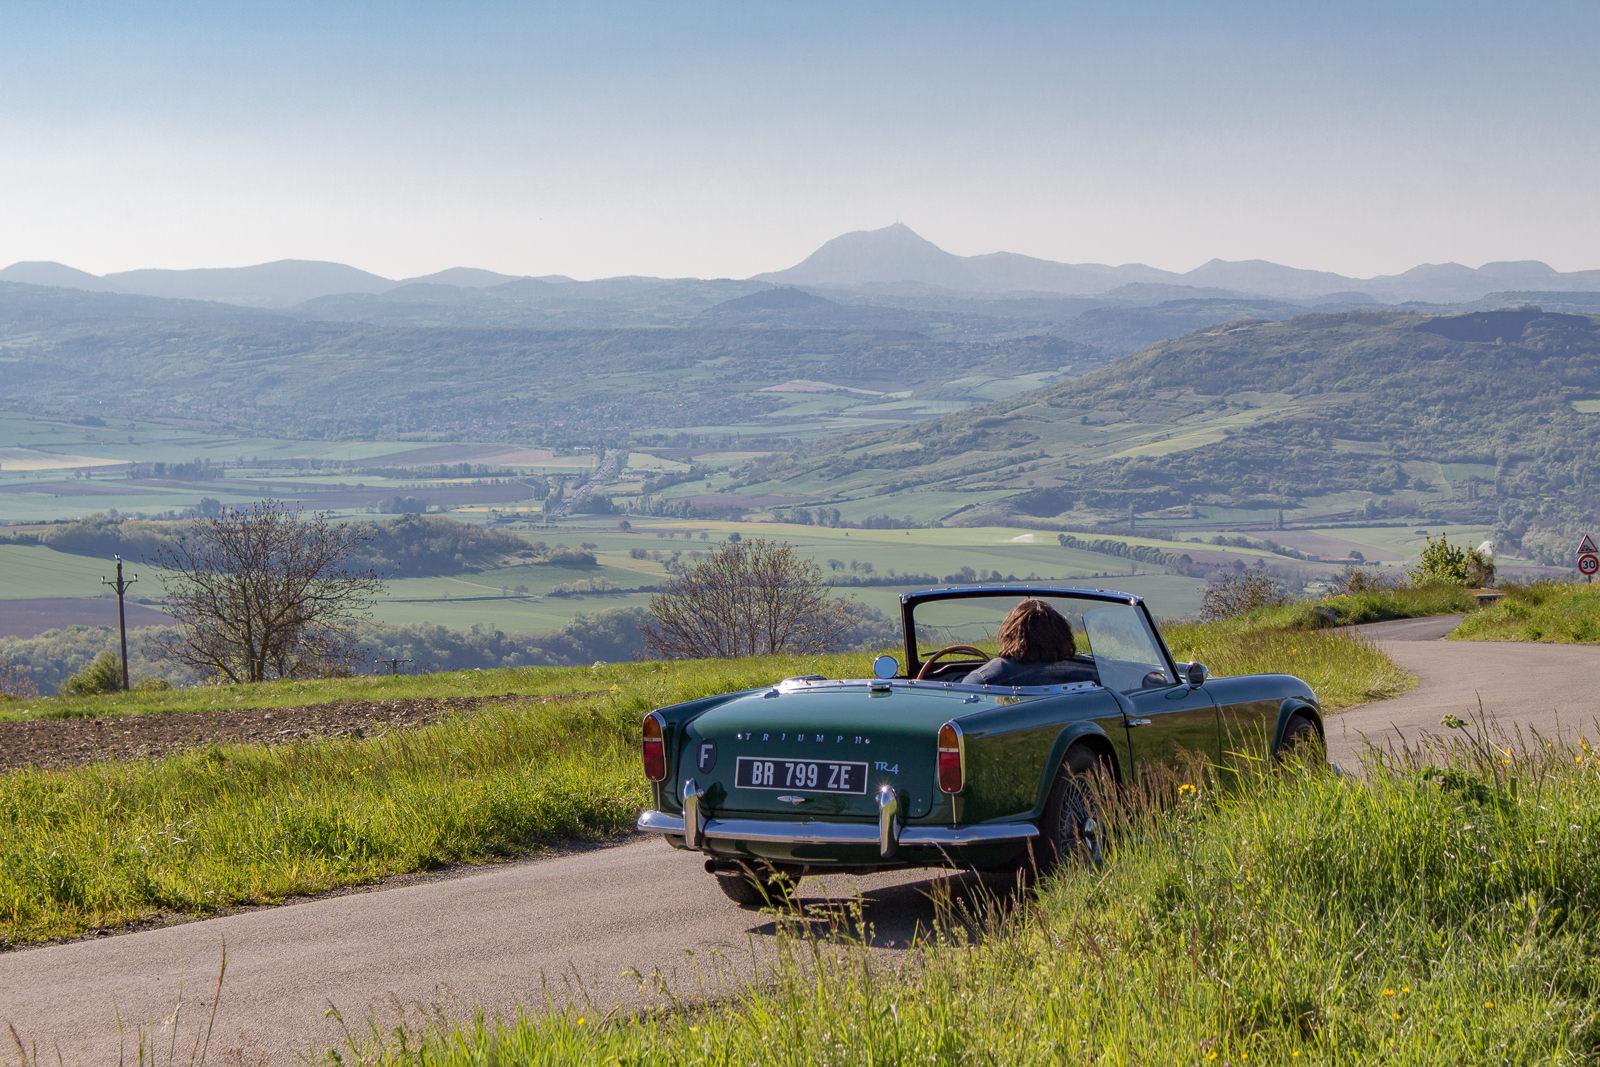 Auvergne, toskanische Auvergne, Cabriotour, Oldtimer, Vintage Car, Roadtrip, classicarverne,